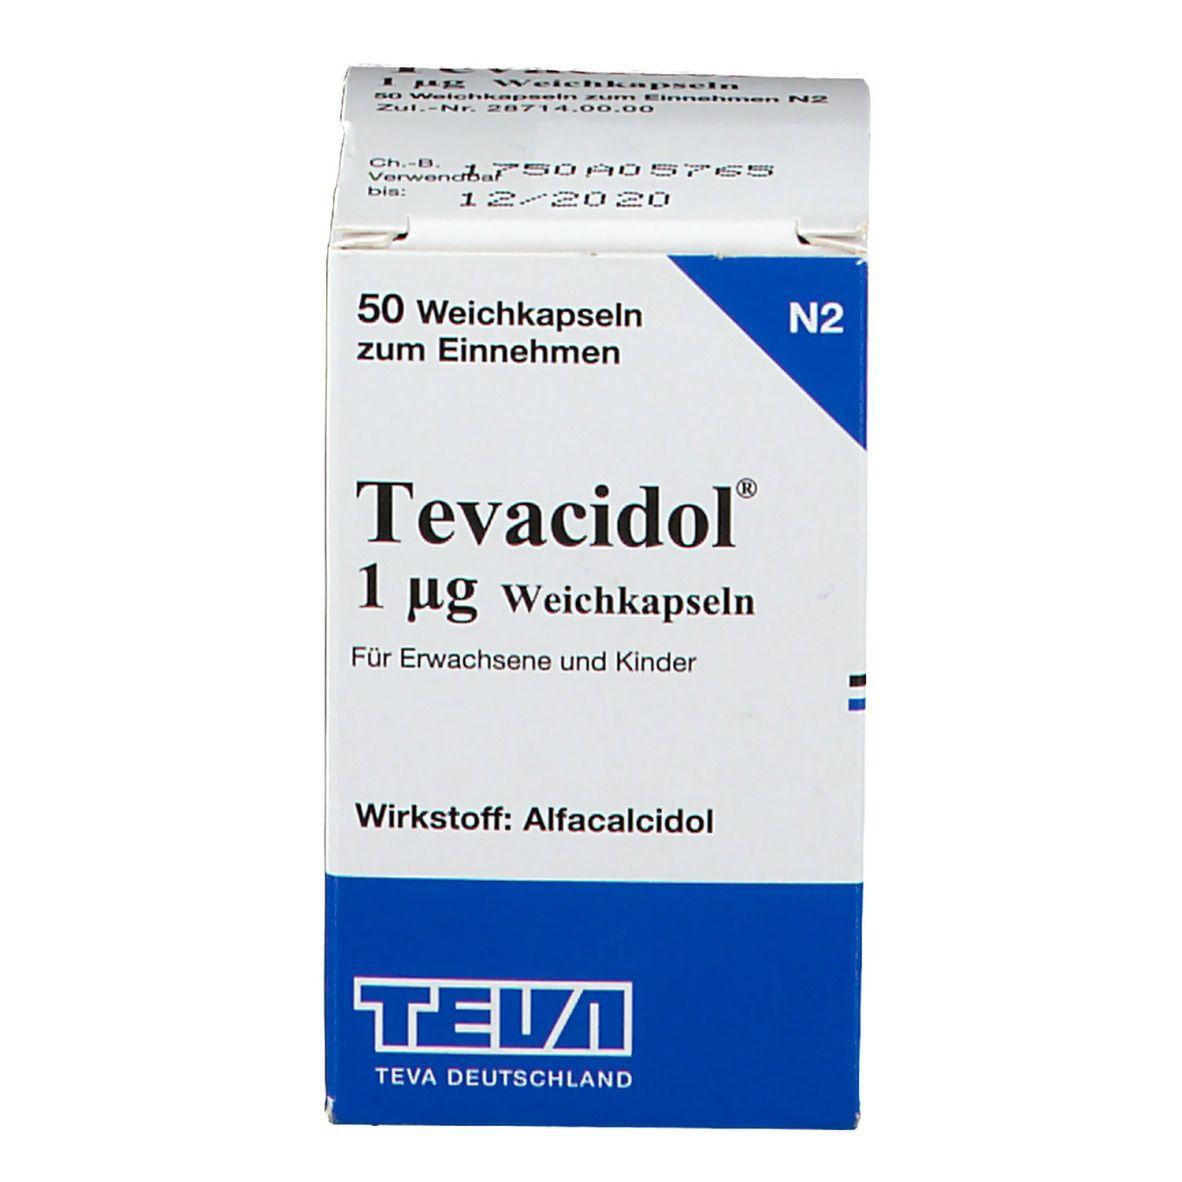 TEVACIDOL 1 µg Weichkapseln